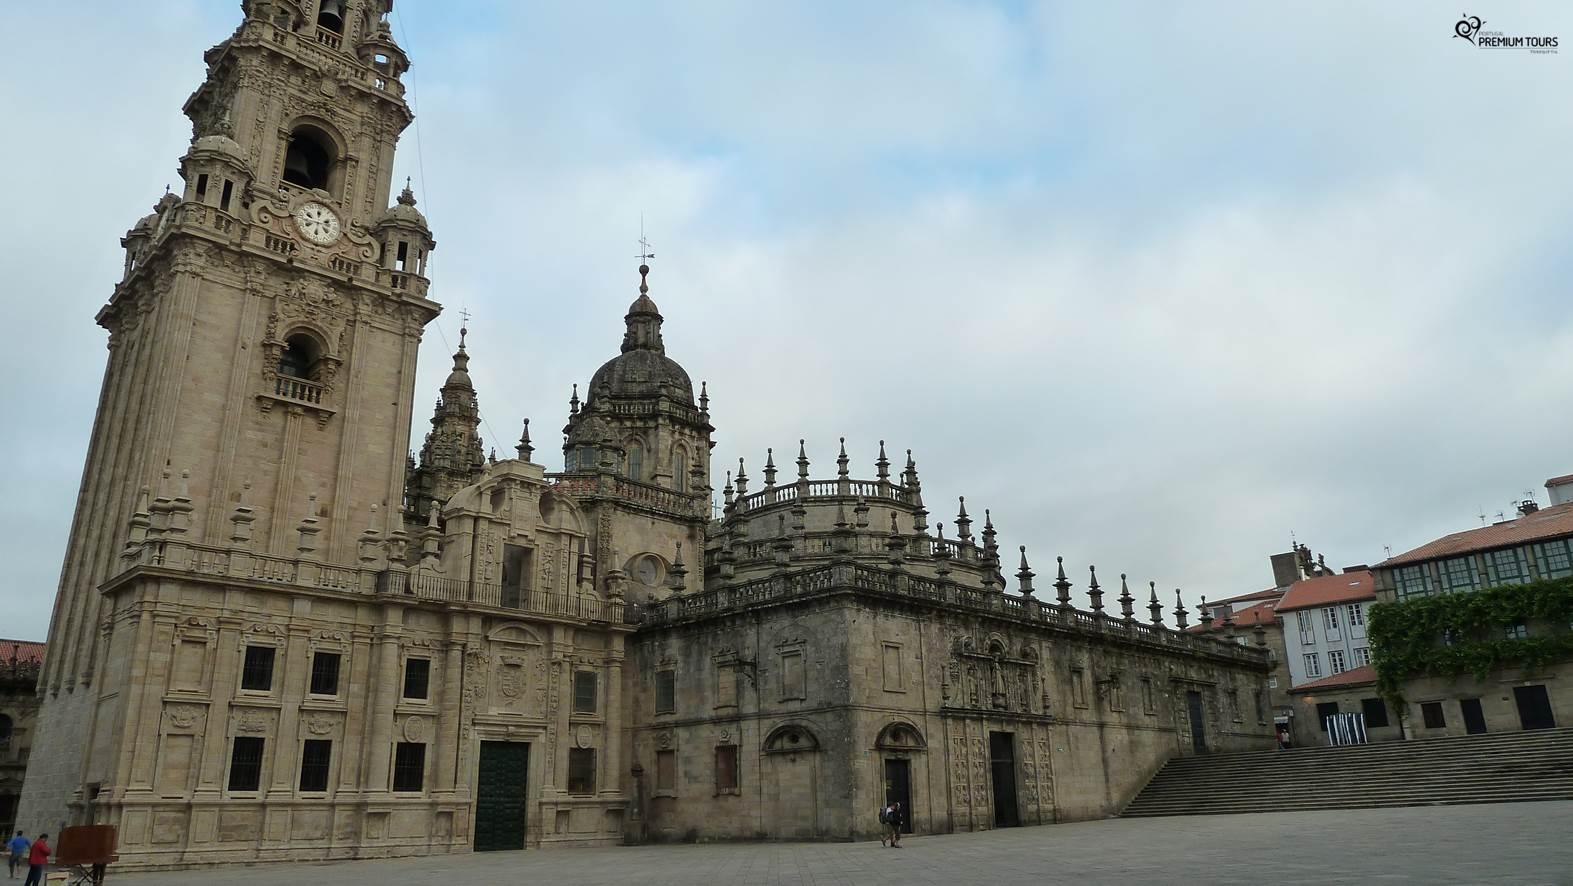 Armarios A Medida Santiago De Compostela : Paseo privado ruta cristiana portugal premium tours